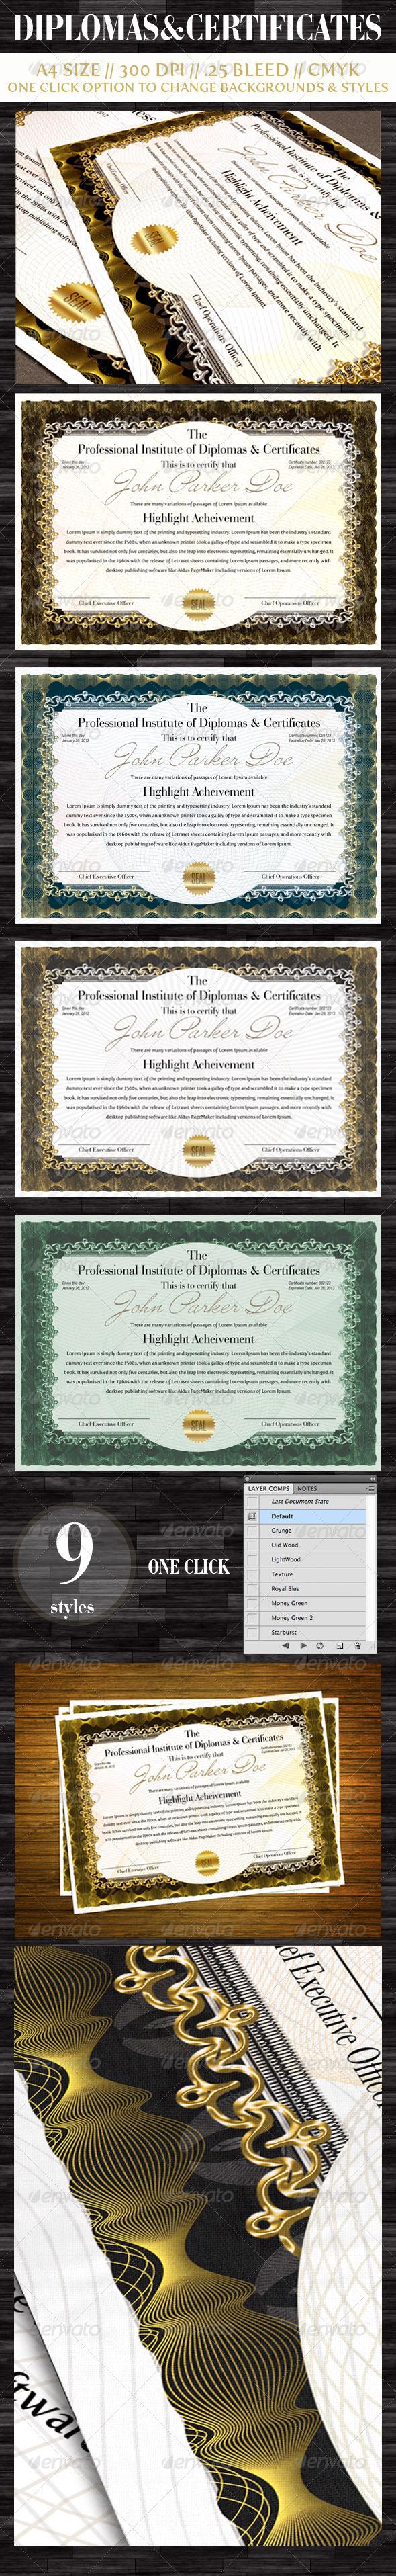 GraphicRiver Diplomas & Certificates 1573633